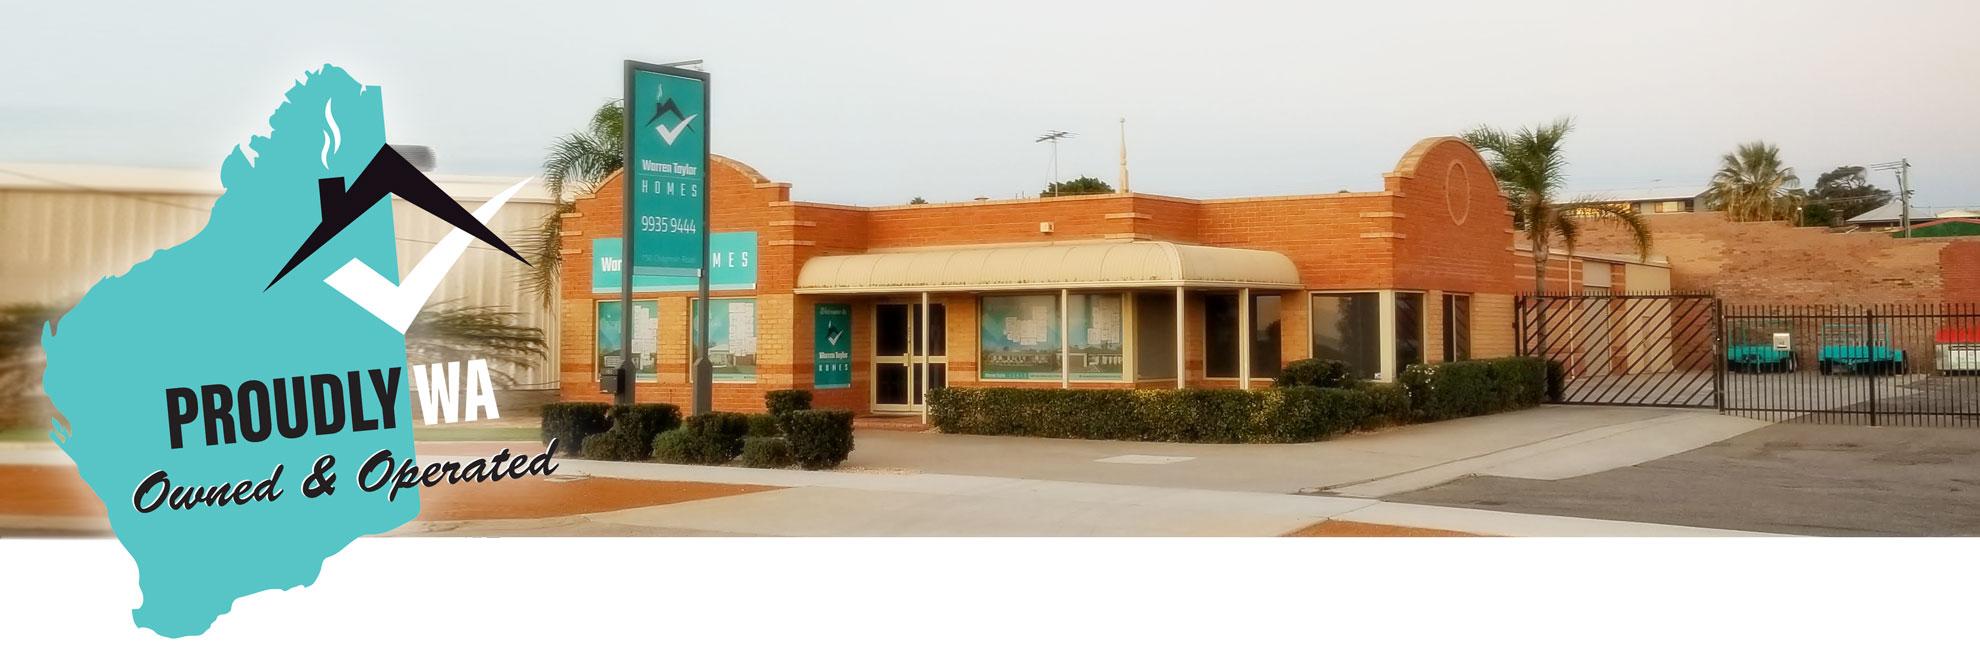 Warren Taylor Home Builders Office In Geraldton Western Australia